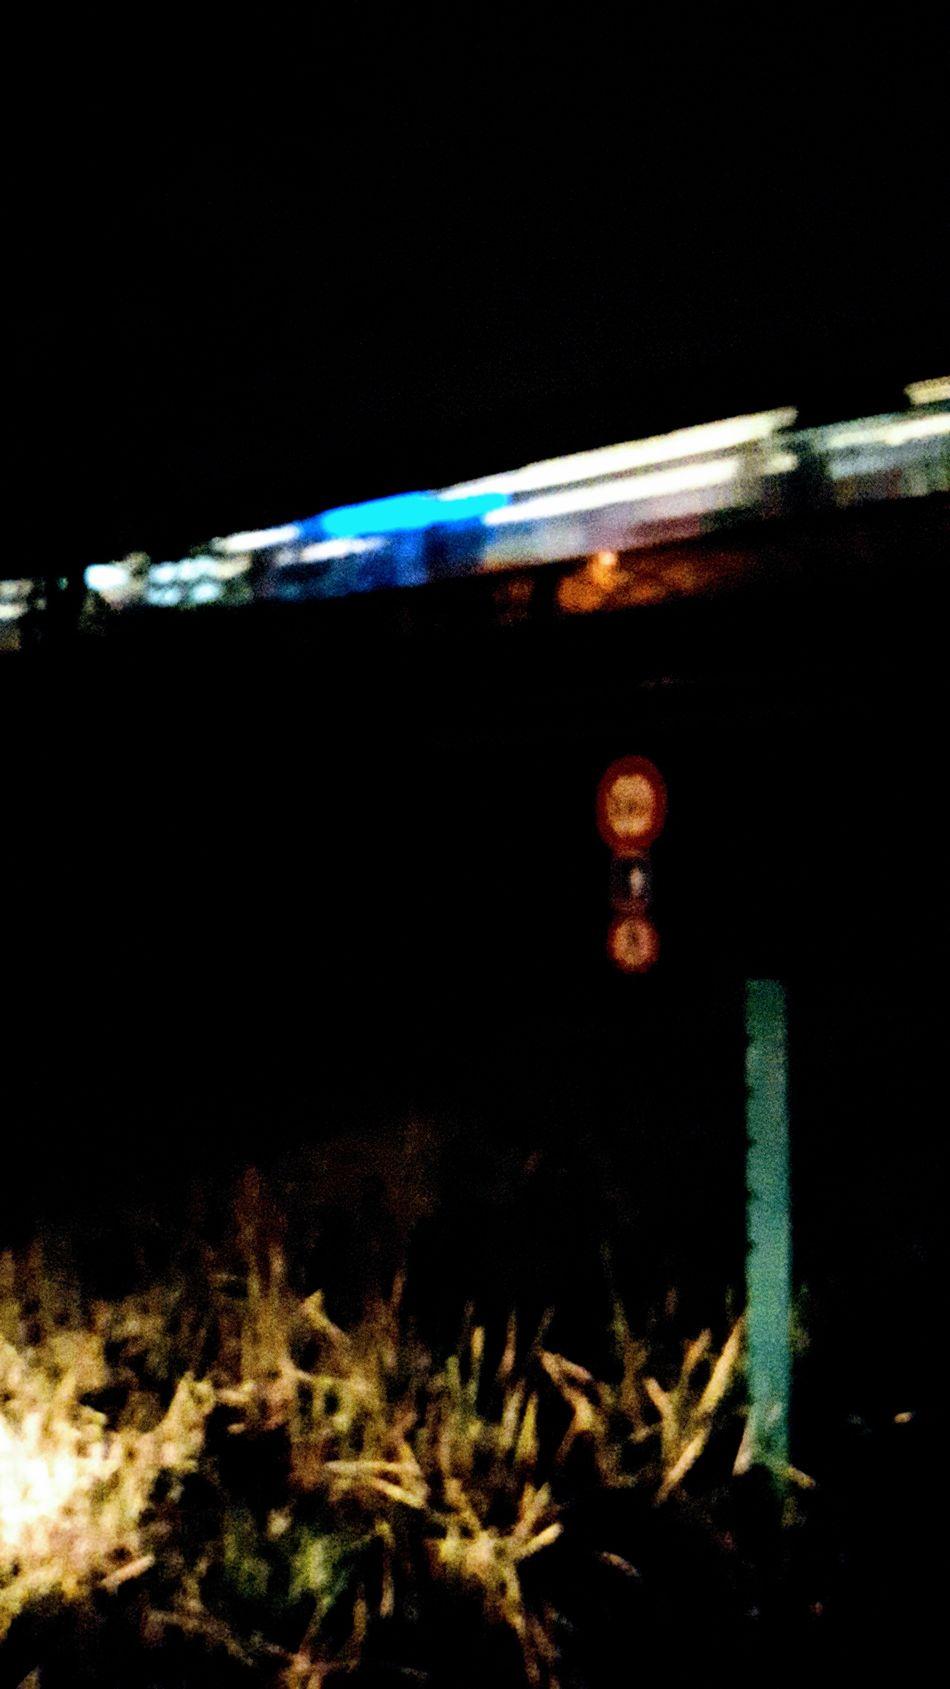 Night Nightphotography Night Lights Light And Darkness  Cars Lights Light On The Ground Train Train On The Bridge Train Lights Road Signal Eyemphotography Eye4photography  EyeEm Gallery